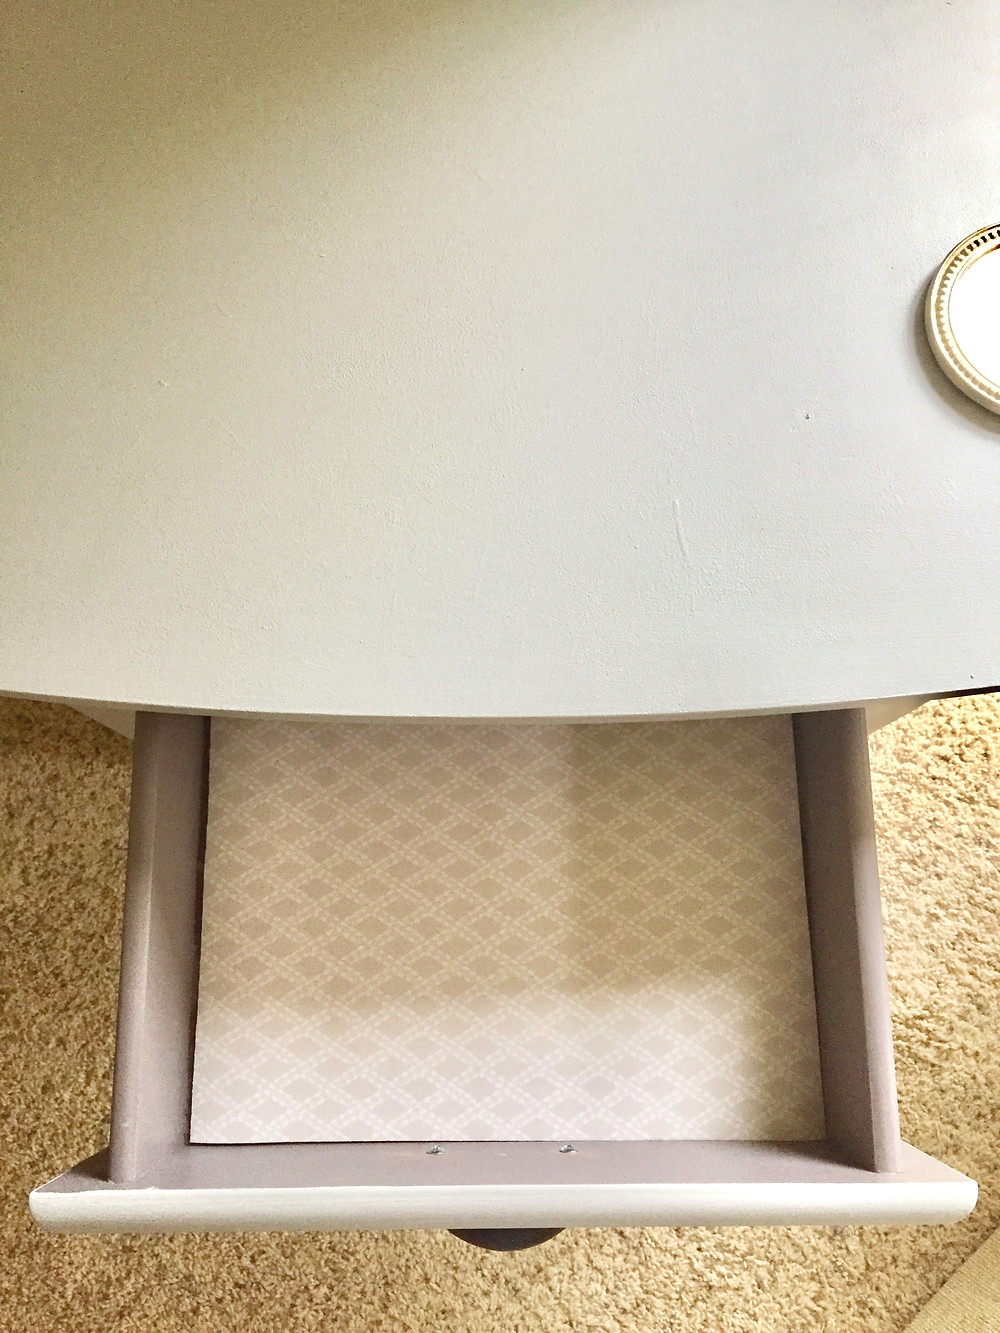 DIY furniture refinish Sherwin Williams Online